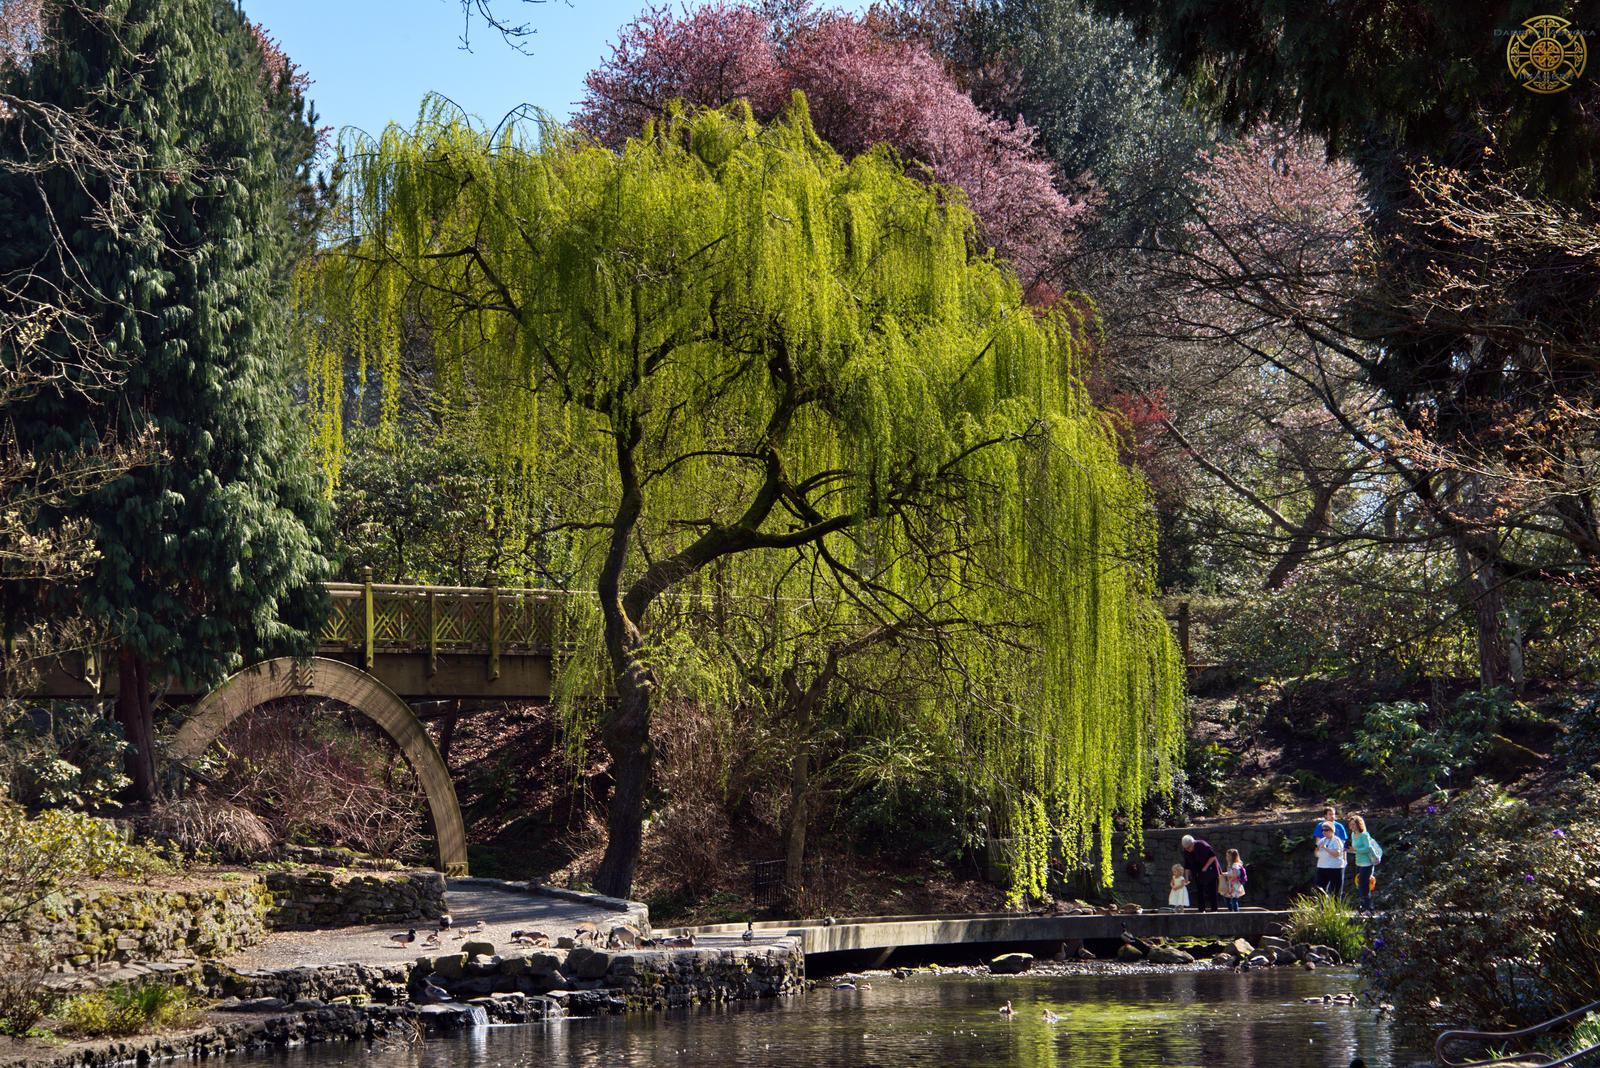 Crystal springs rhododendron garden 102 by darrian ashoka on deviantart for Crystal springs rhododendron garden